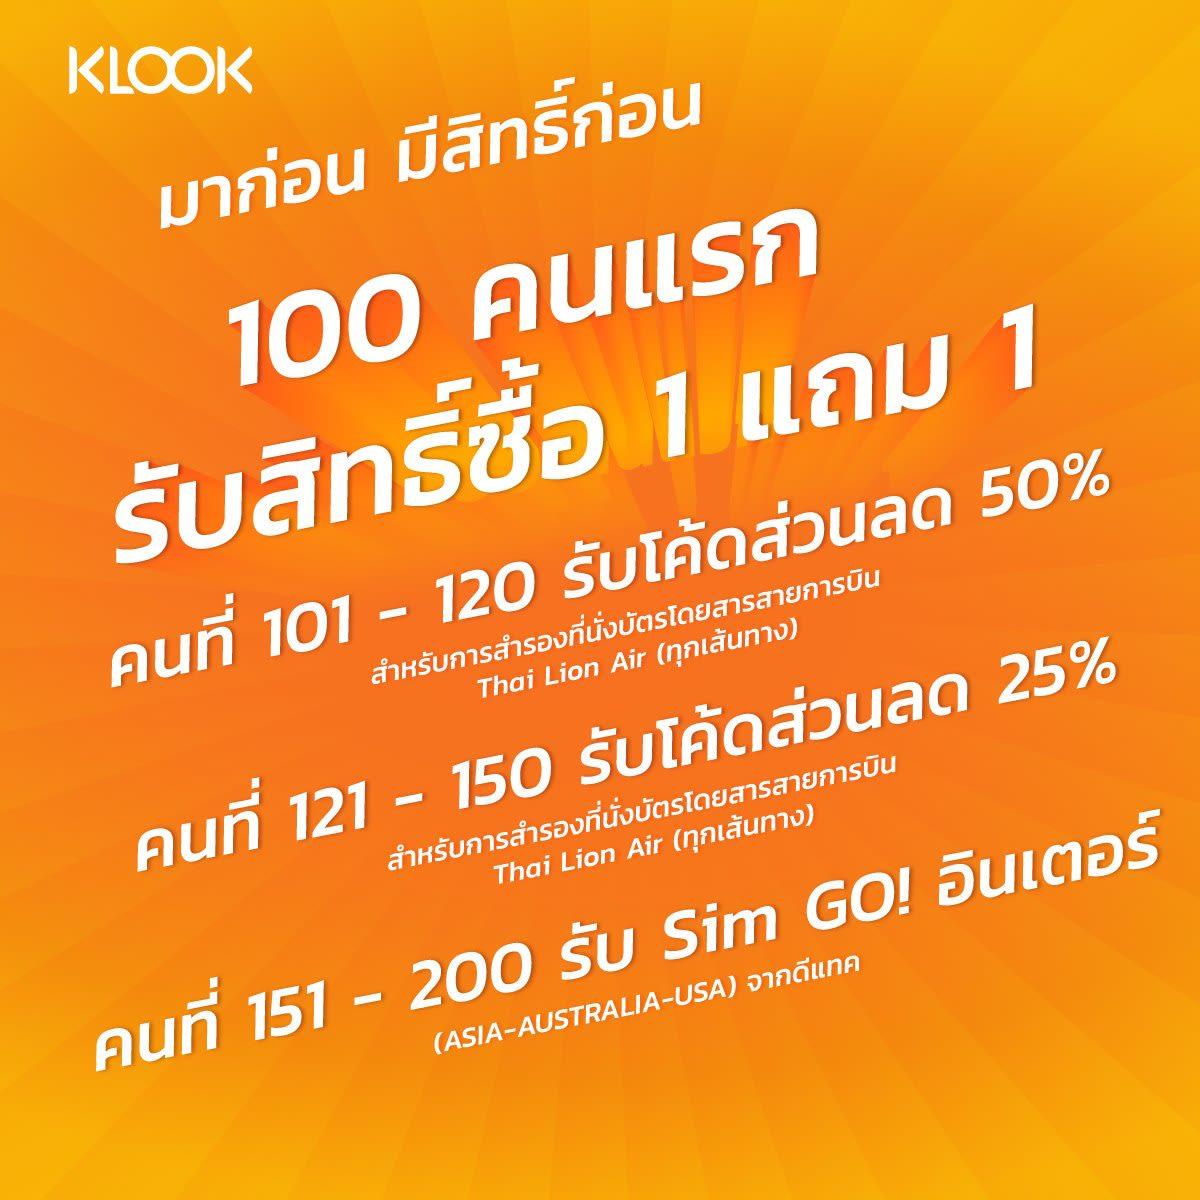 klook flash sale